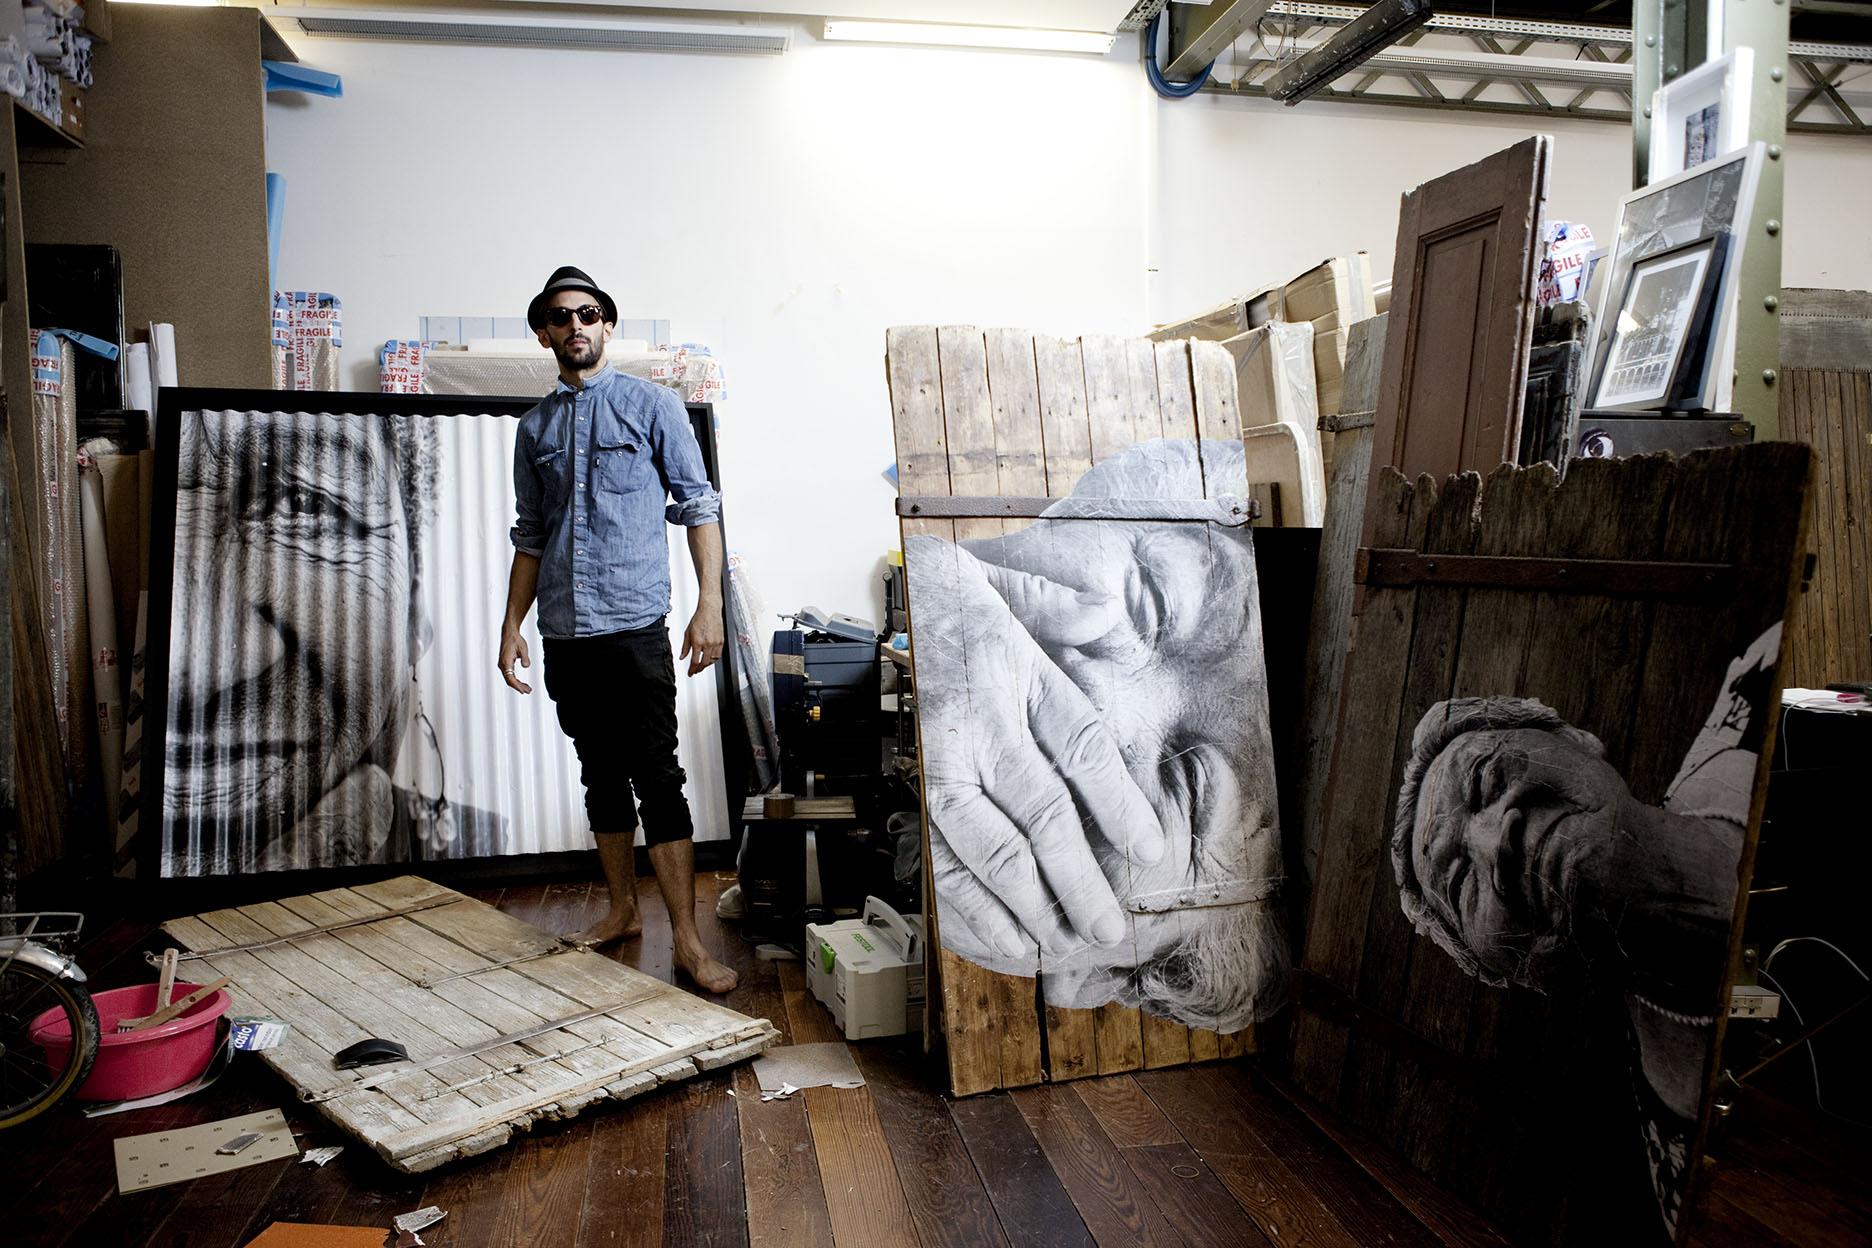 JR in his Paris studio